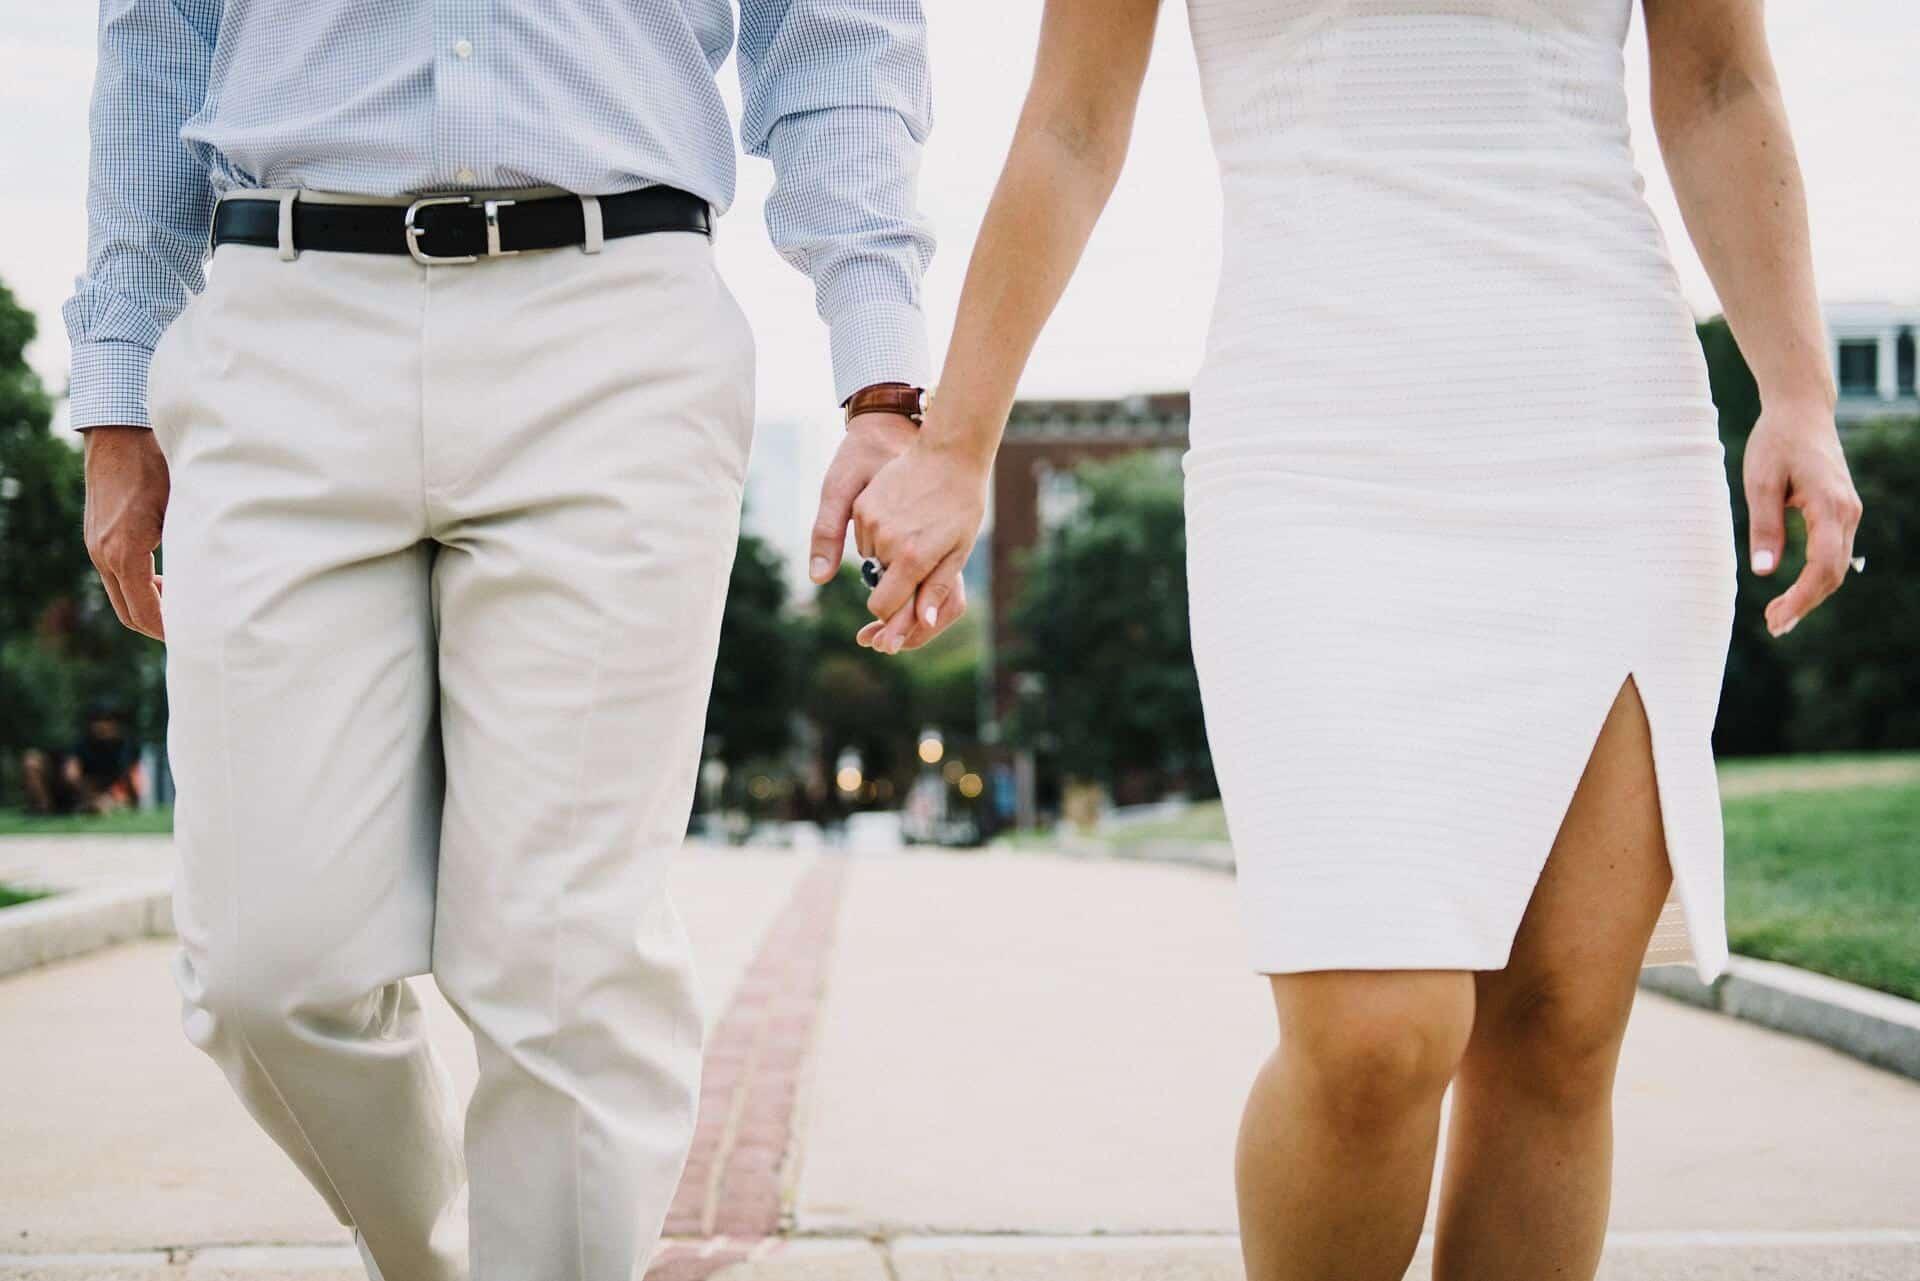 5 Effective Ways to Combat Wedding Planning Stress